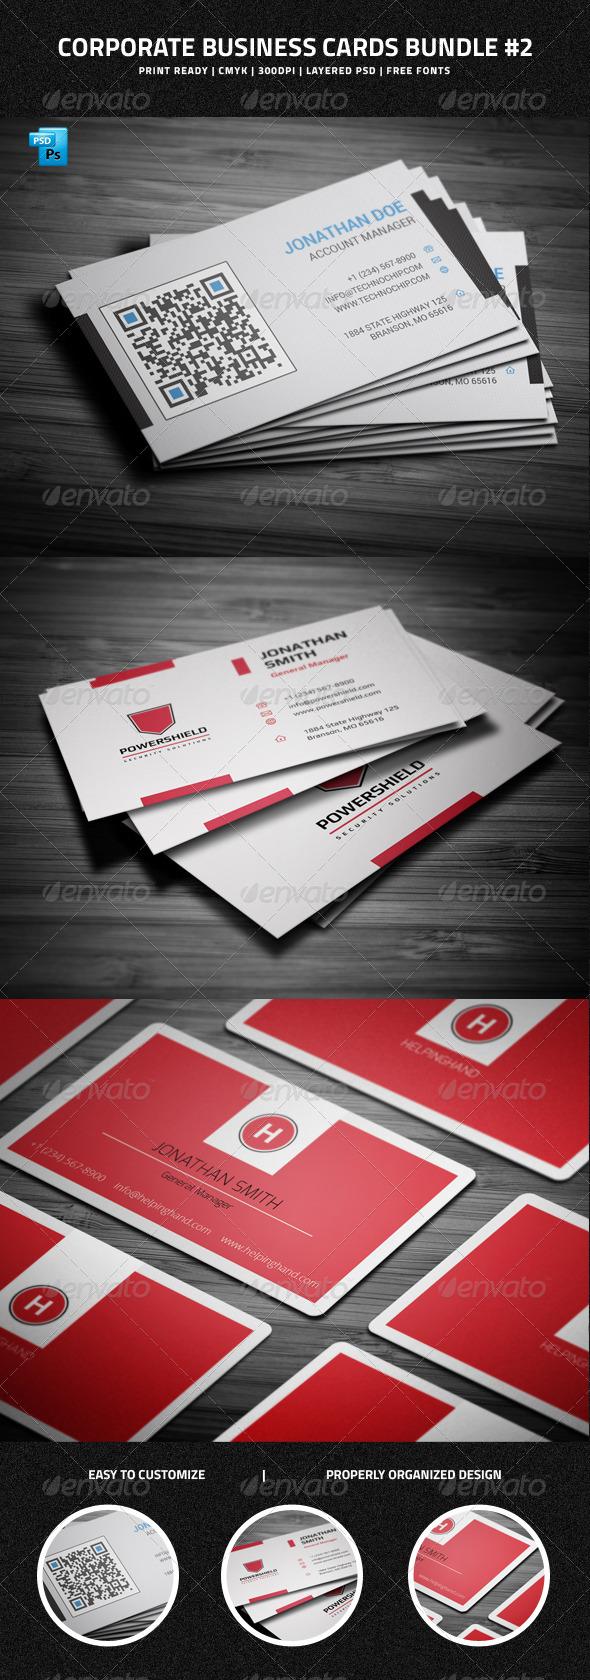 Corporate Business Cards Bundle #2 - Corporate Business Cards